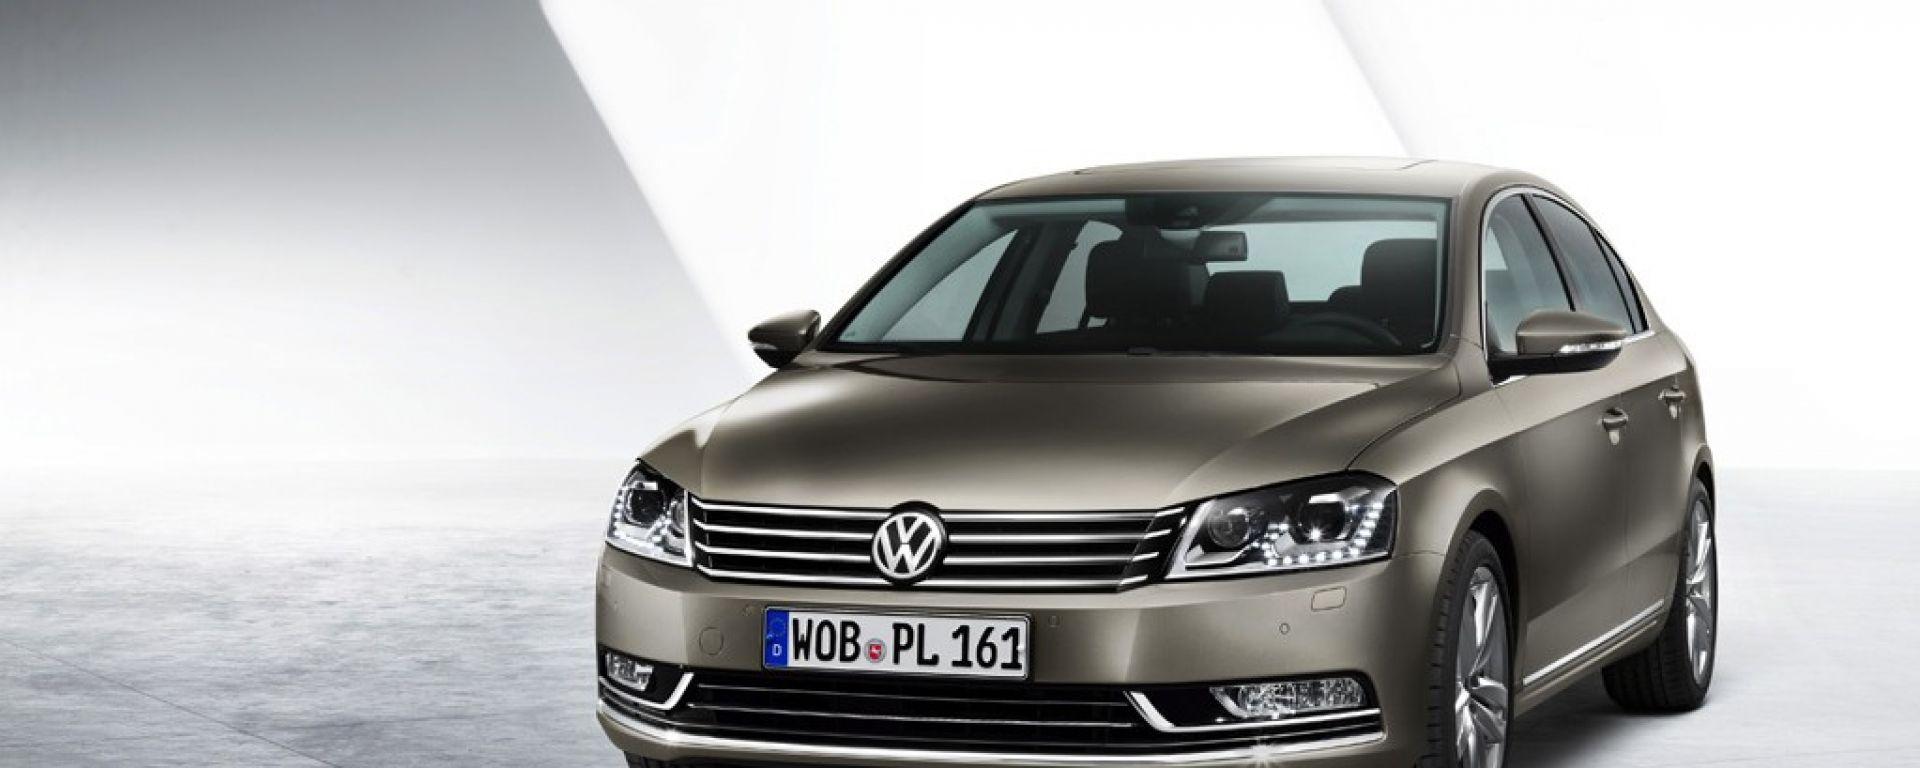 Volkswagen: arriverà nel 2013 l'ibrido plug-in